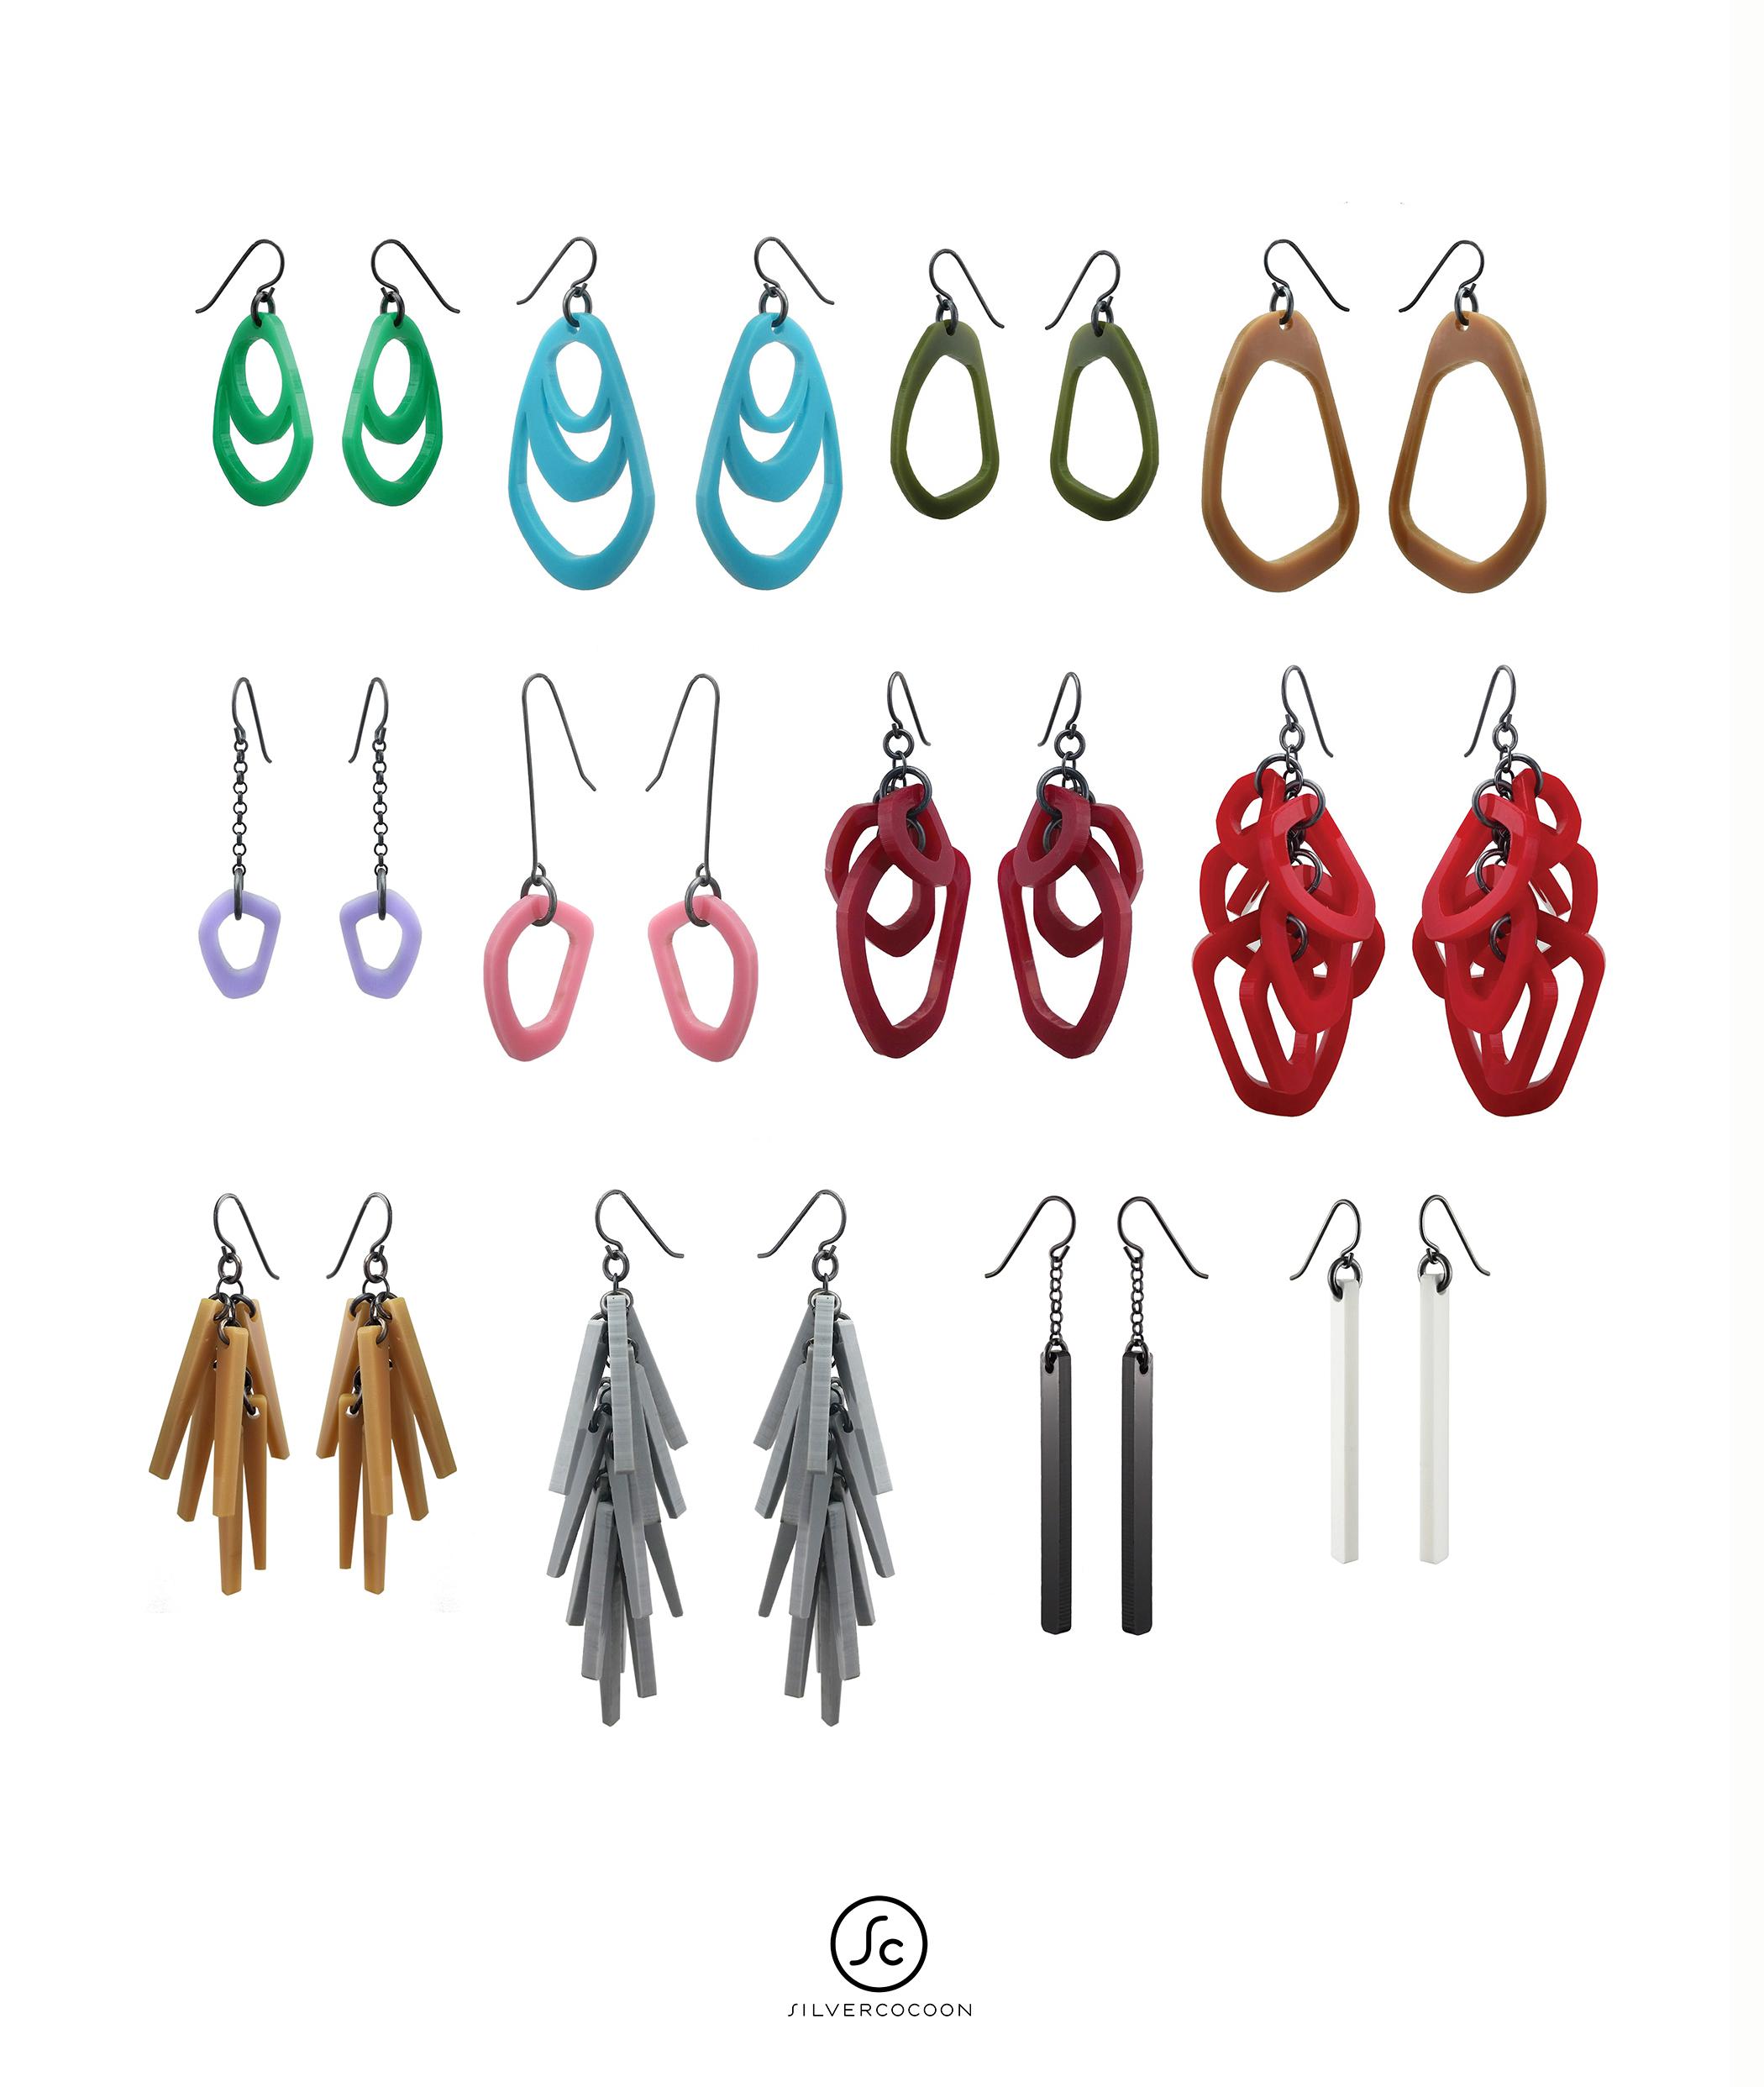 Silvercocoon jewelry: the classics